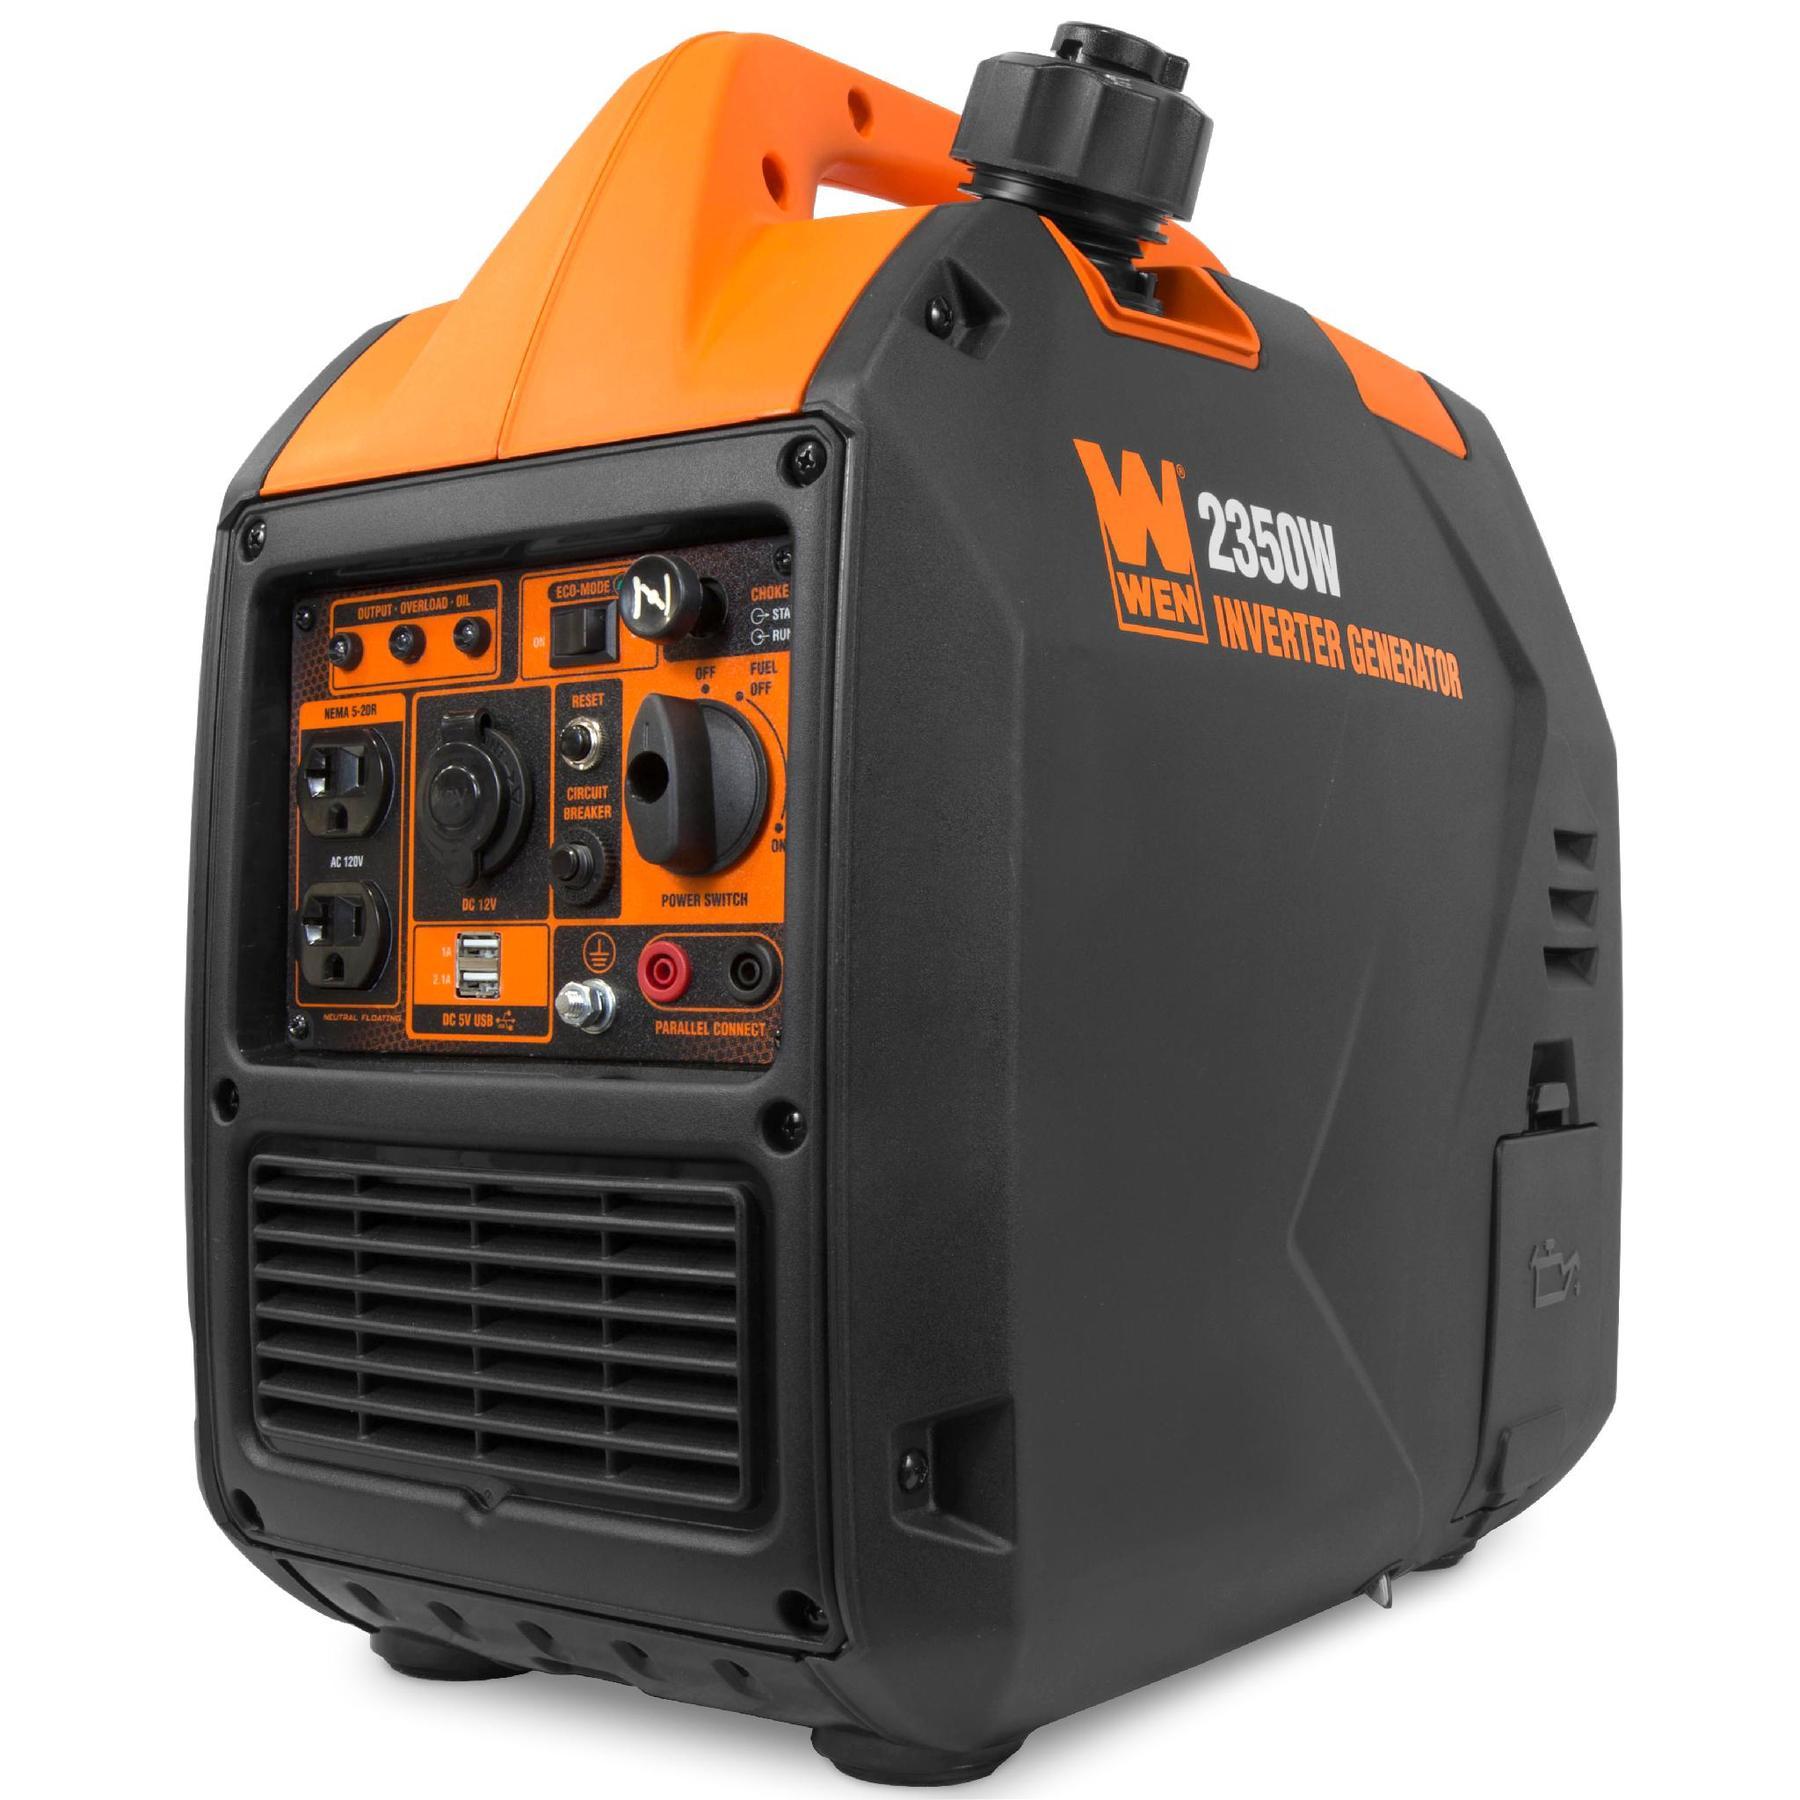 WEN 56235i  78 cc  2350/1900 watt  inverter generator 39 lbs  fuel shut off 8.3 A 12V DC sold and shipped by Walmart.com free shipping $399